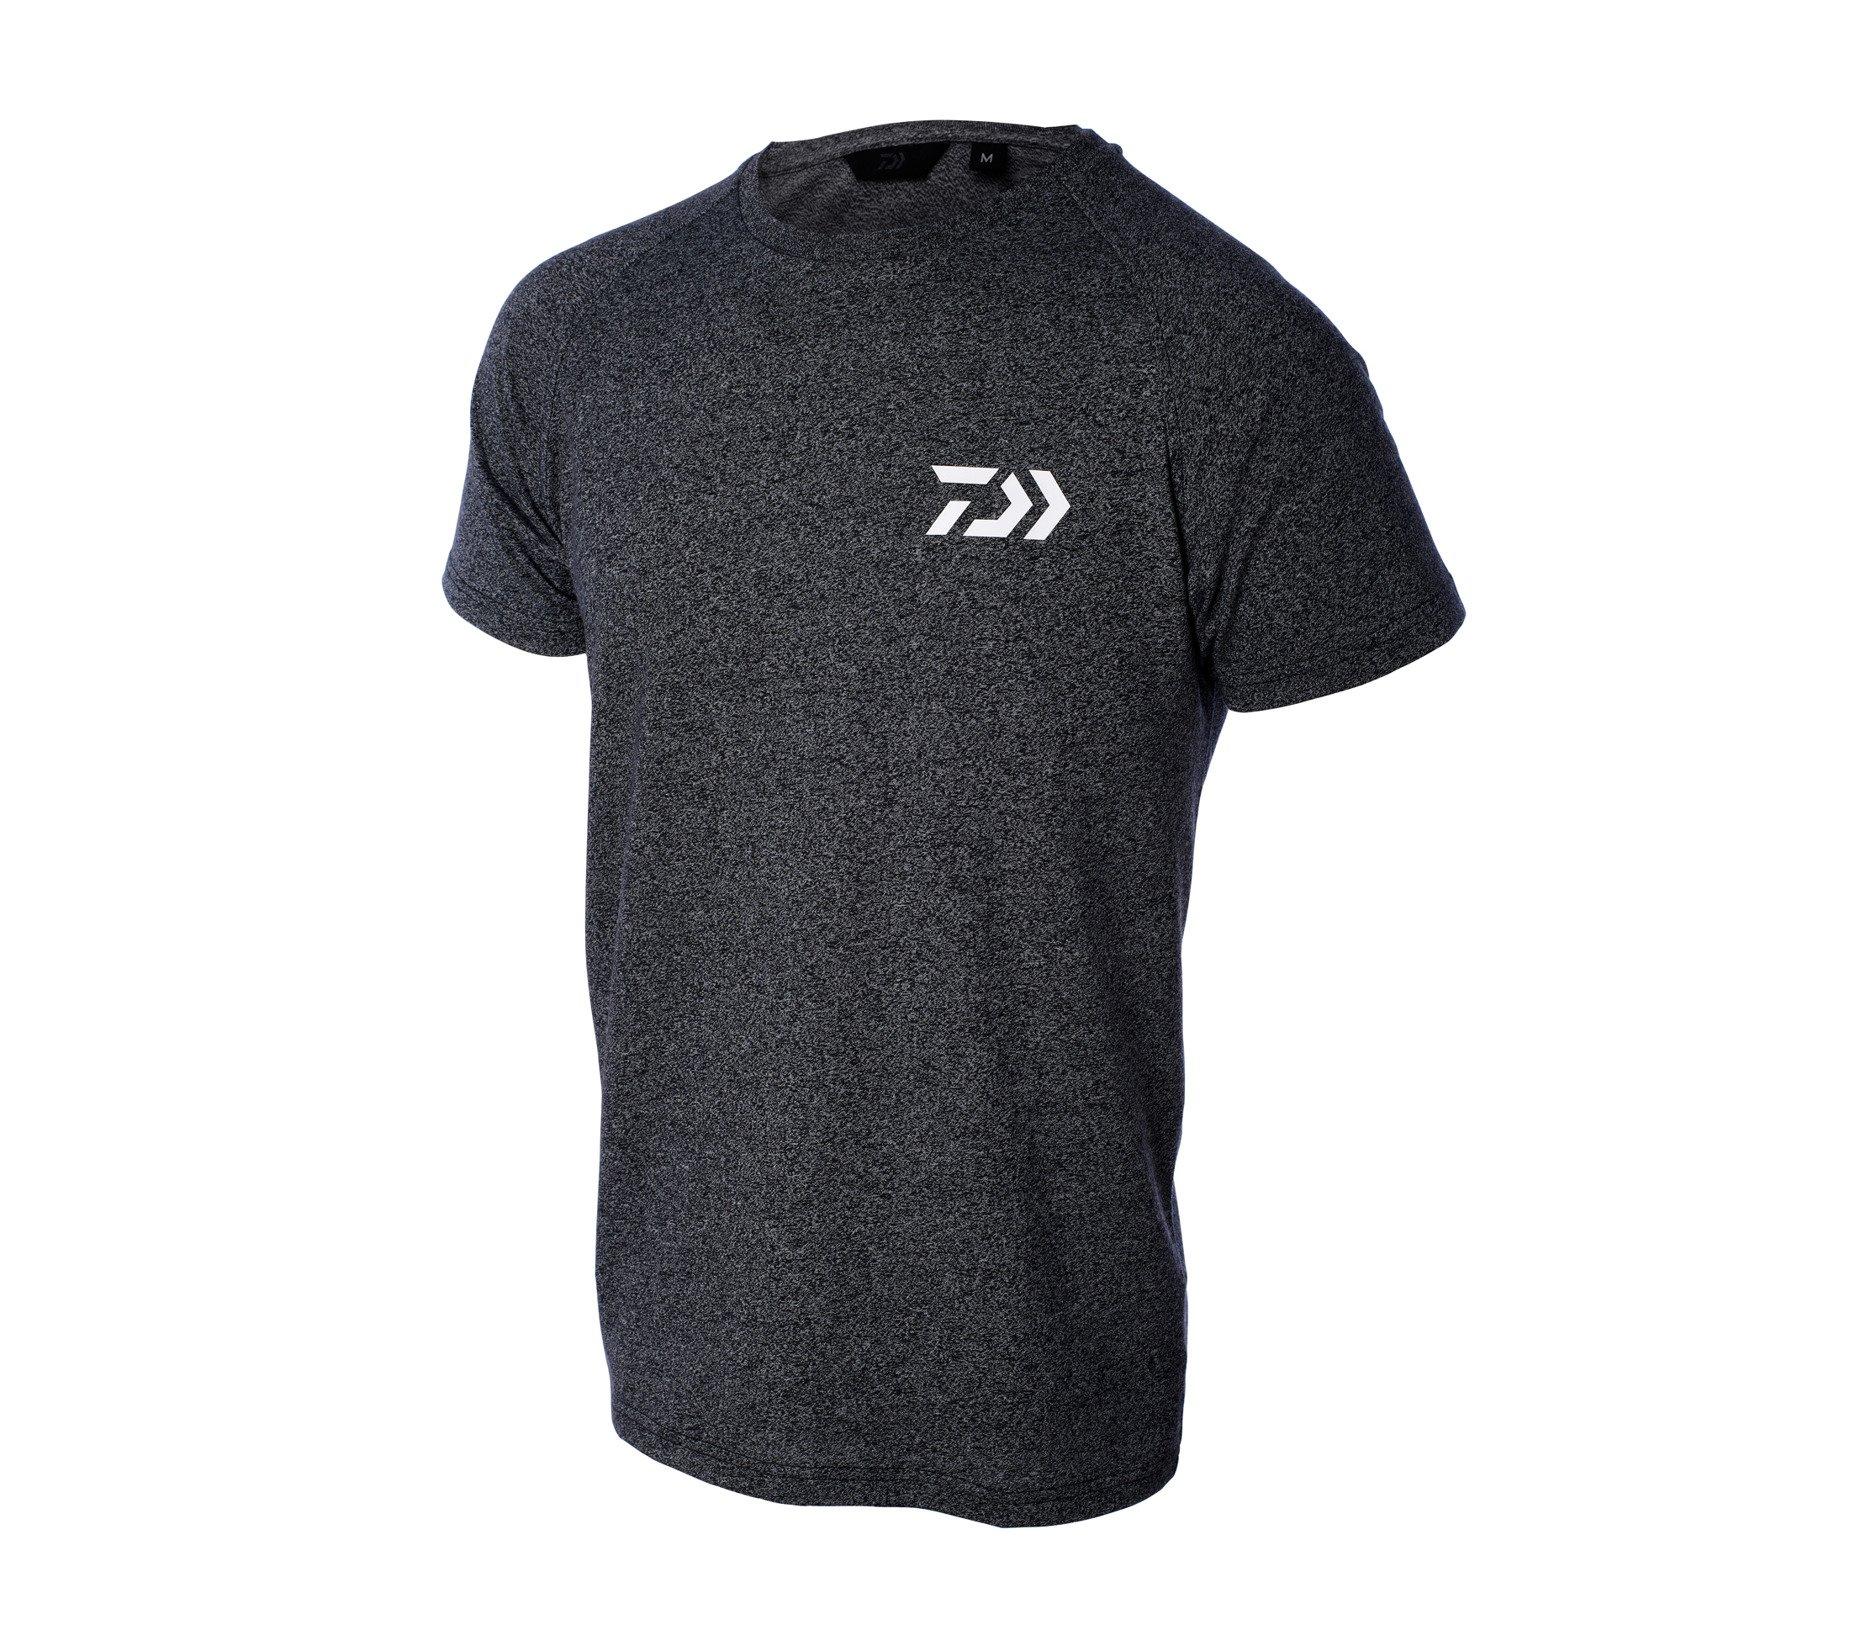 Daiwa T-shirt Grey W Dvec rozm. M